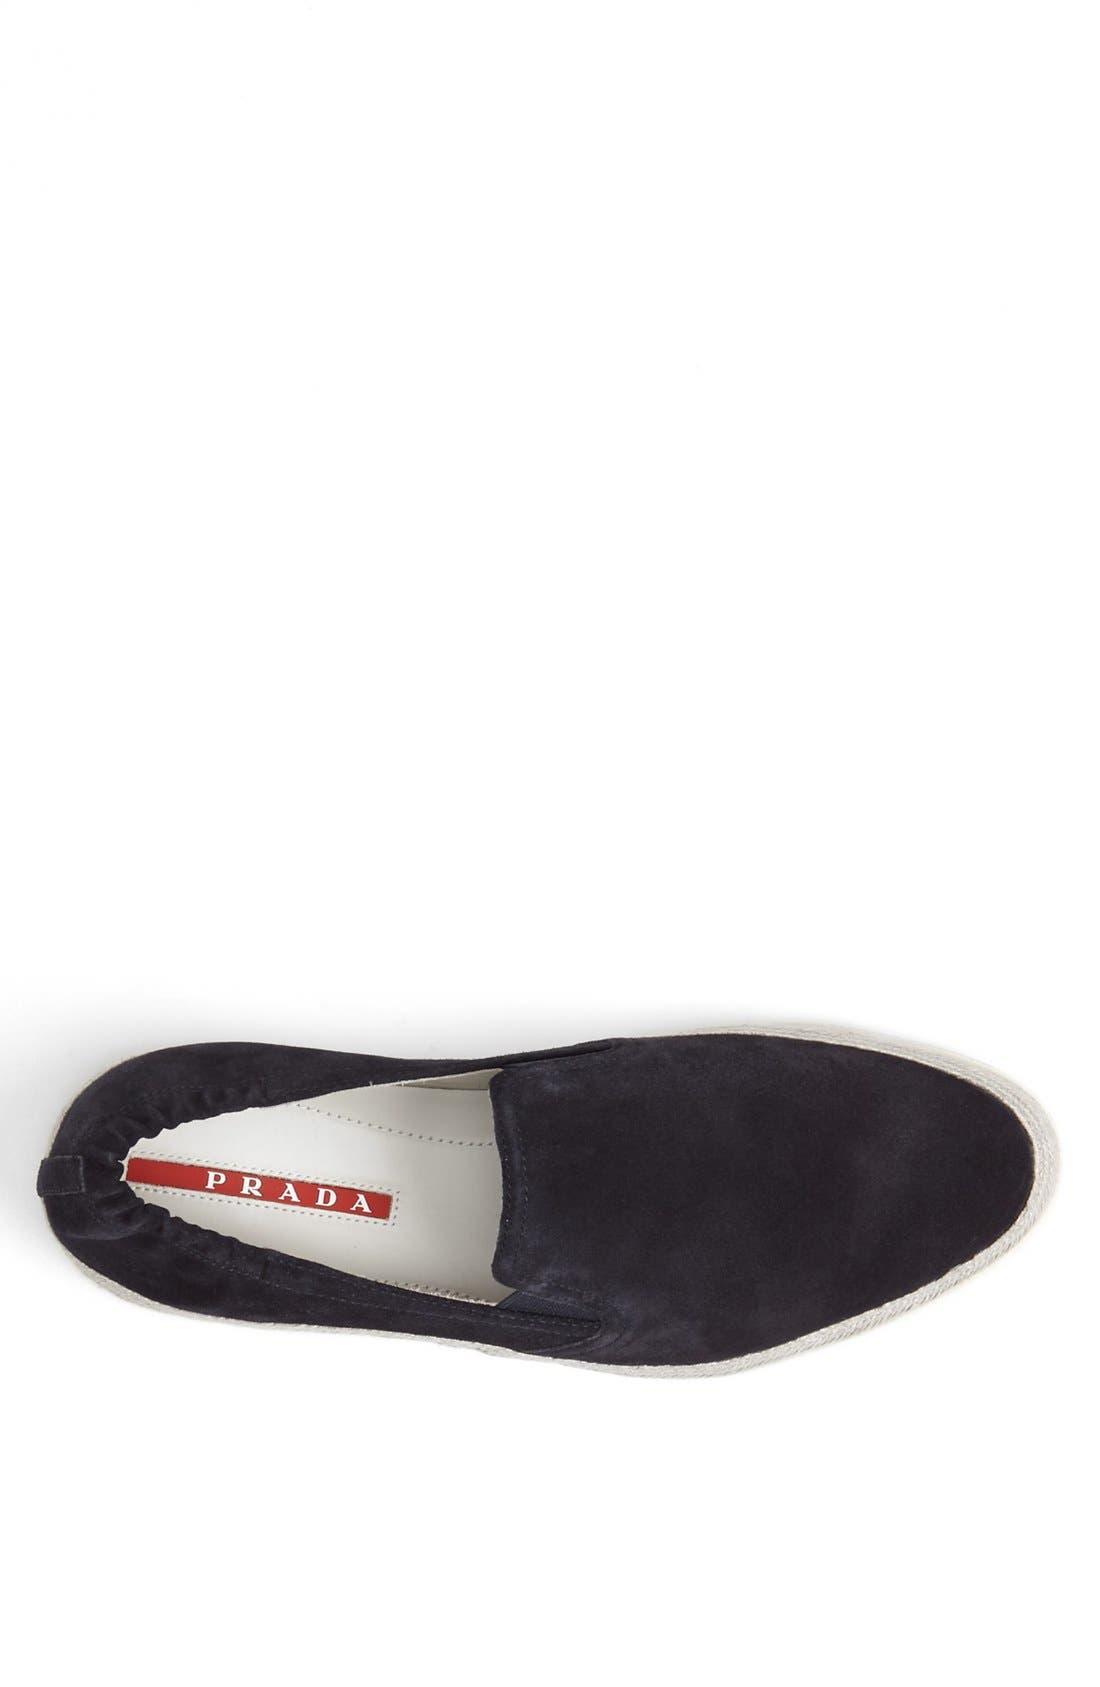 Alternate Image 3  - Prada Espadrille Sneaker